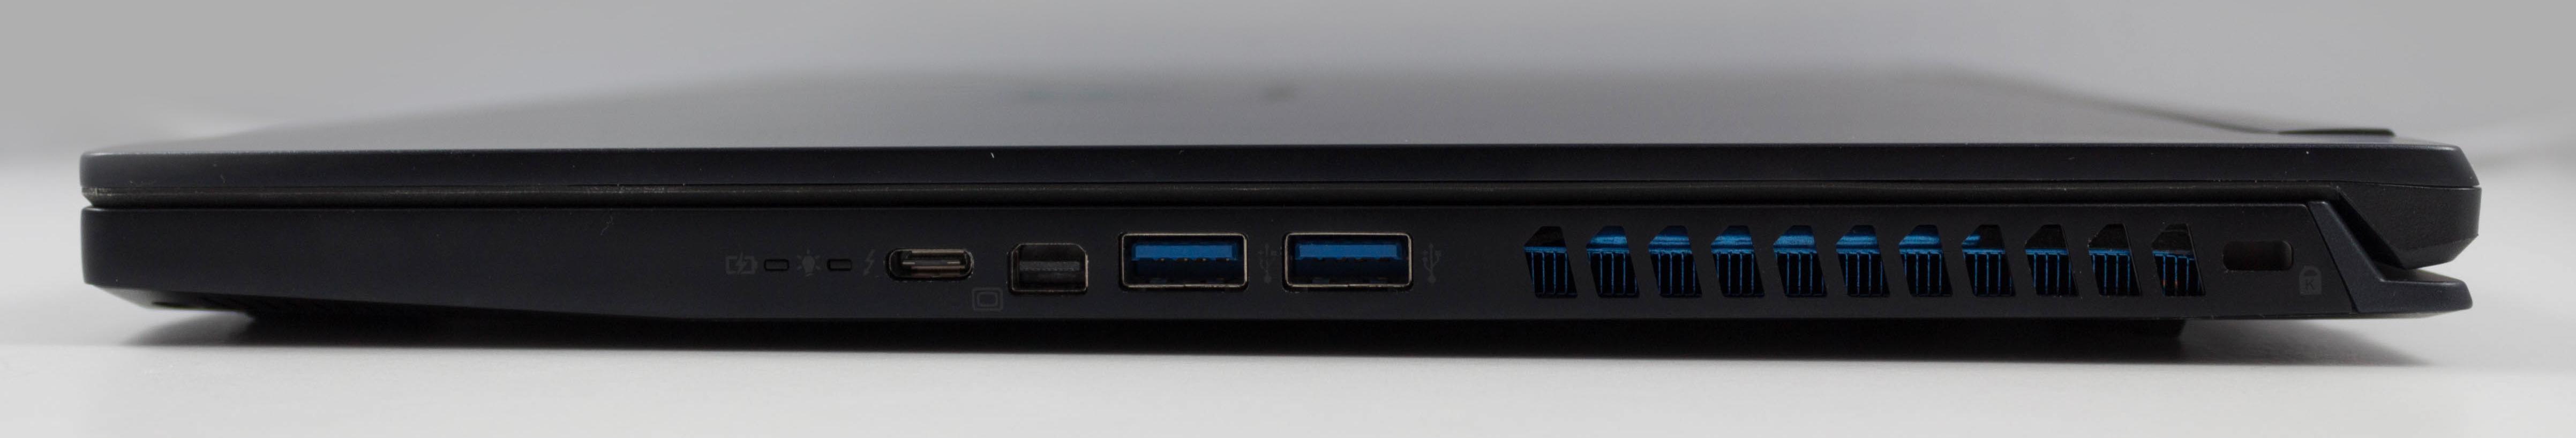 Design - The Acer Predator Triton 500 Laptop Review: Going